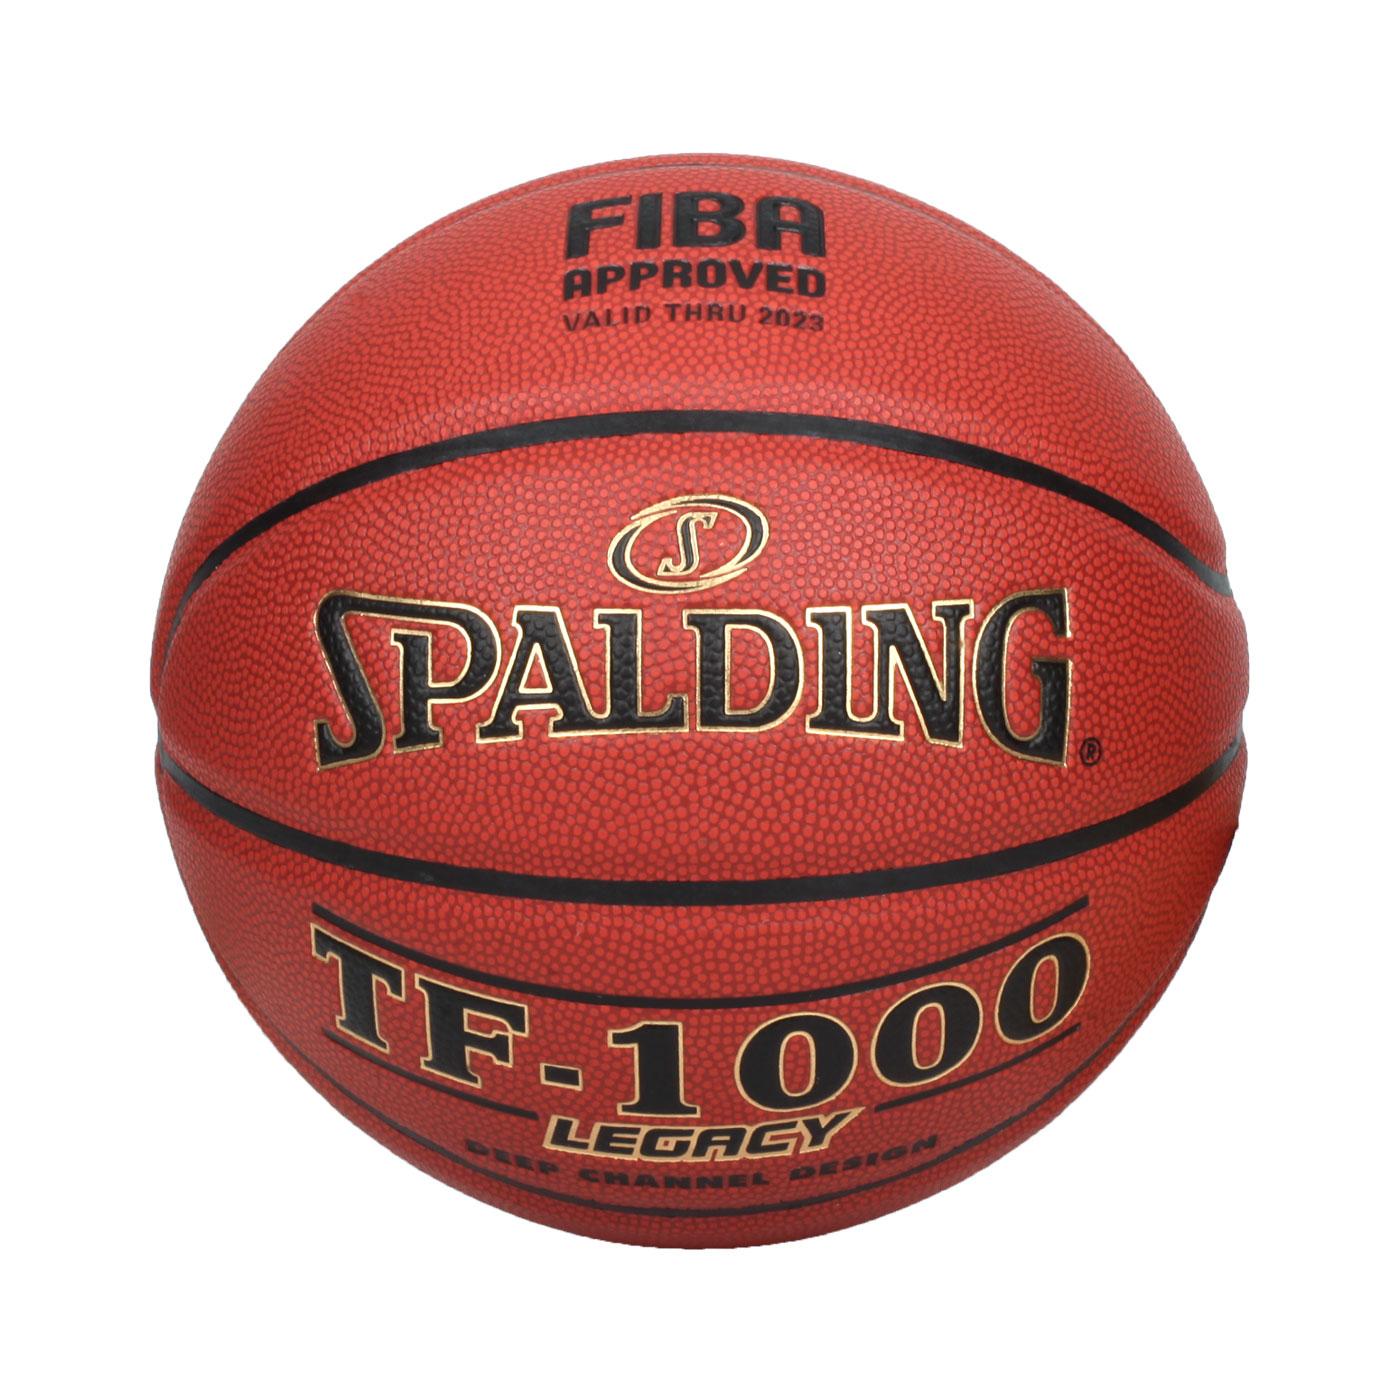 SPALDING TF-1000 Legacy 室內籃球#6號 SPA74451 - 暗橘黑金